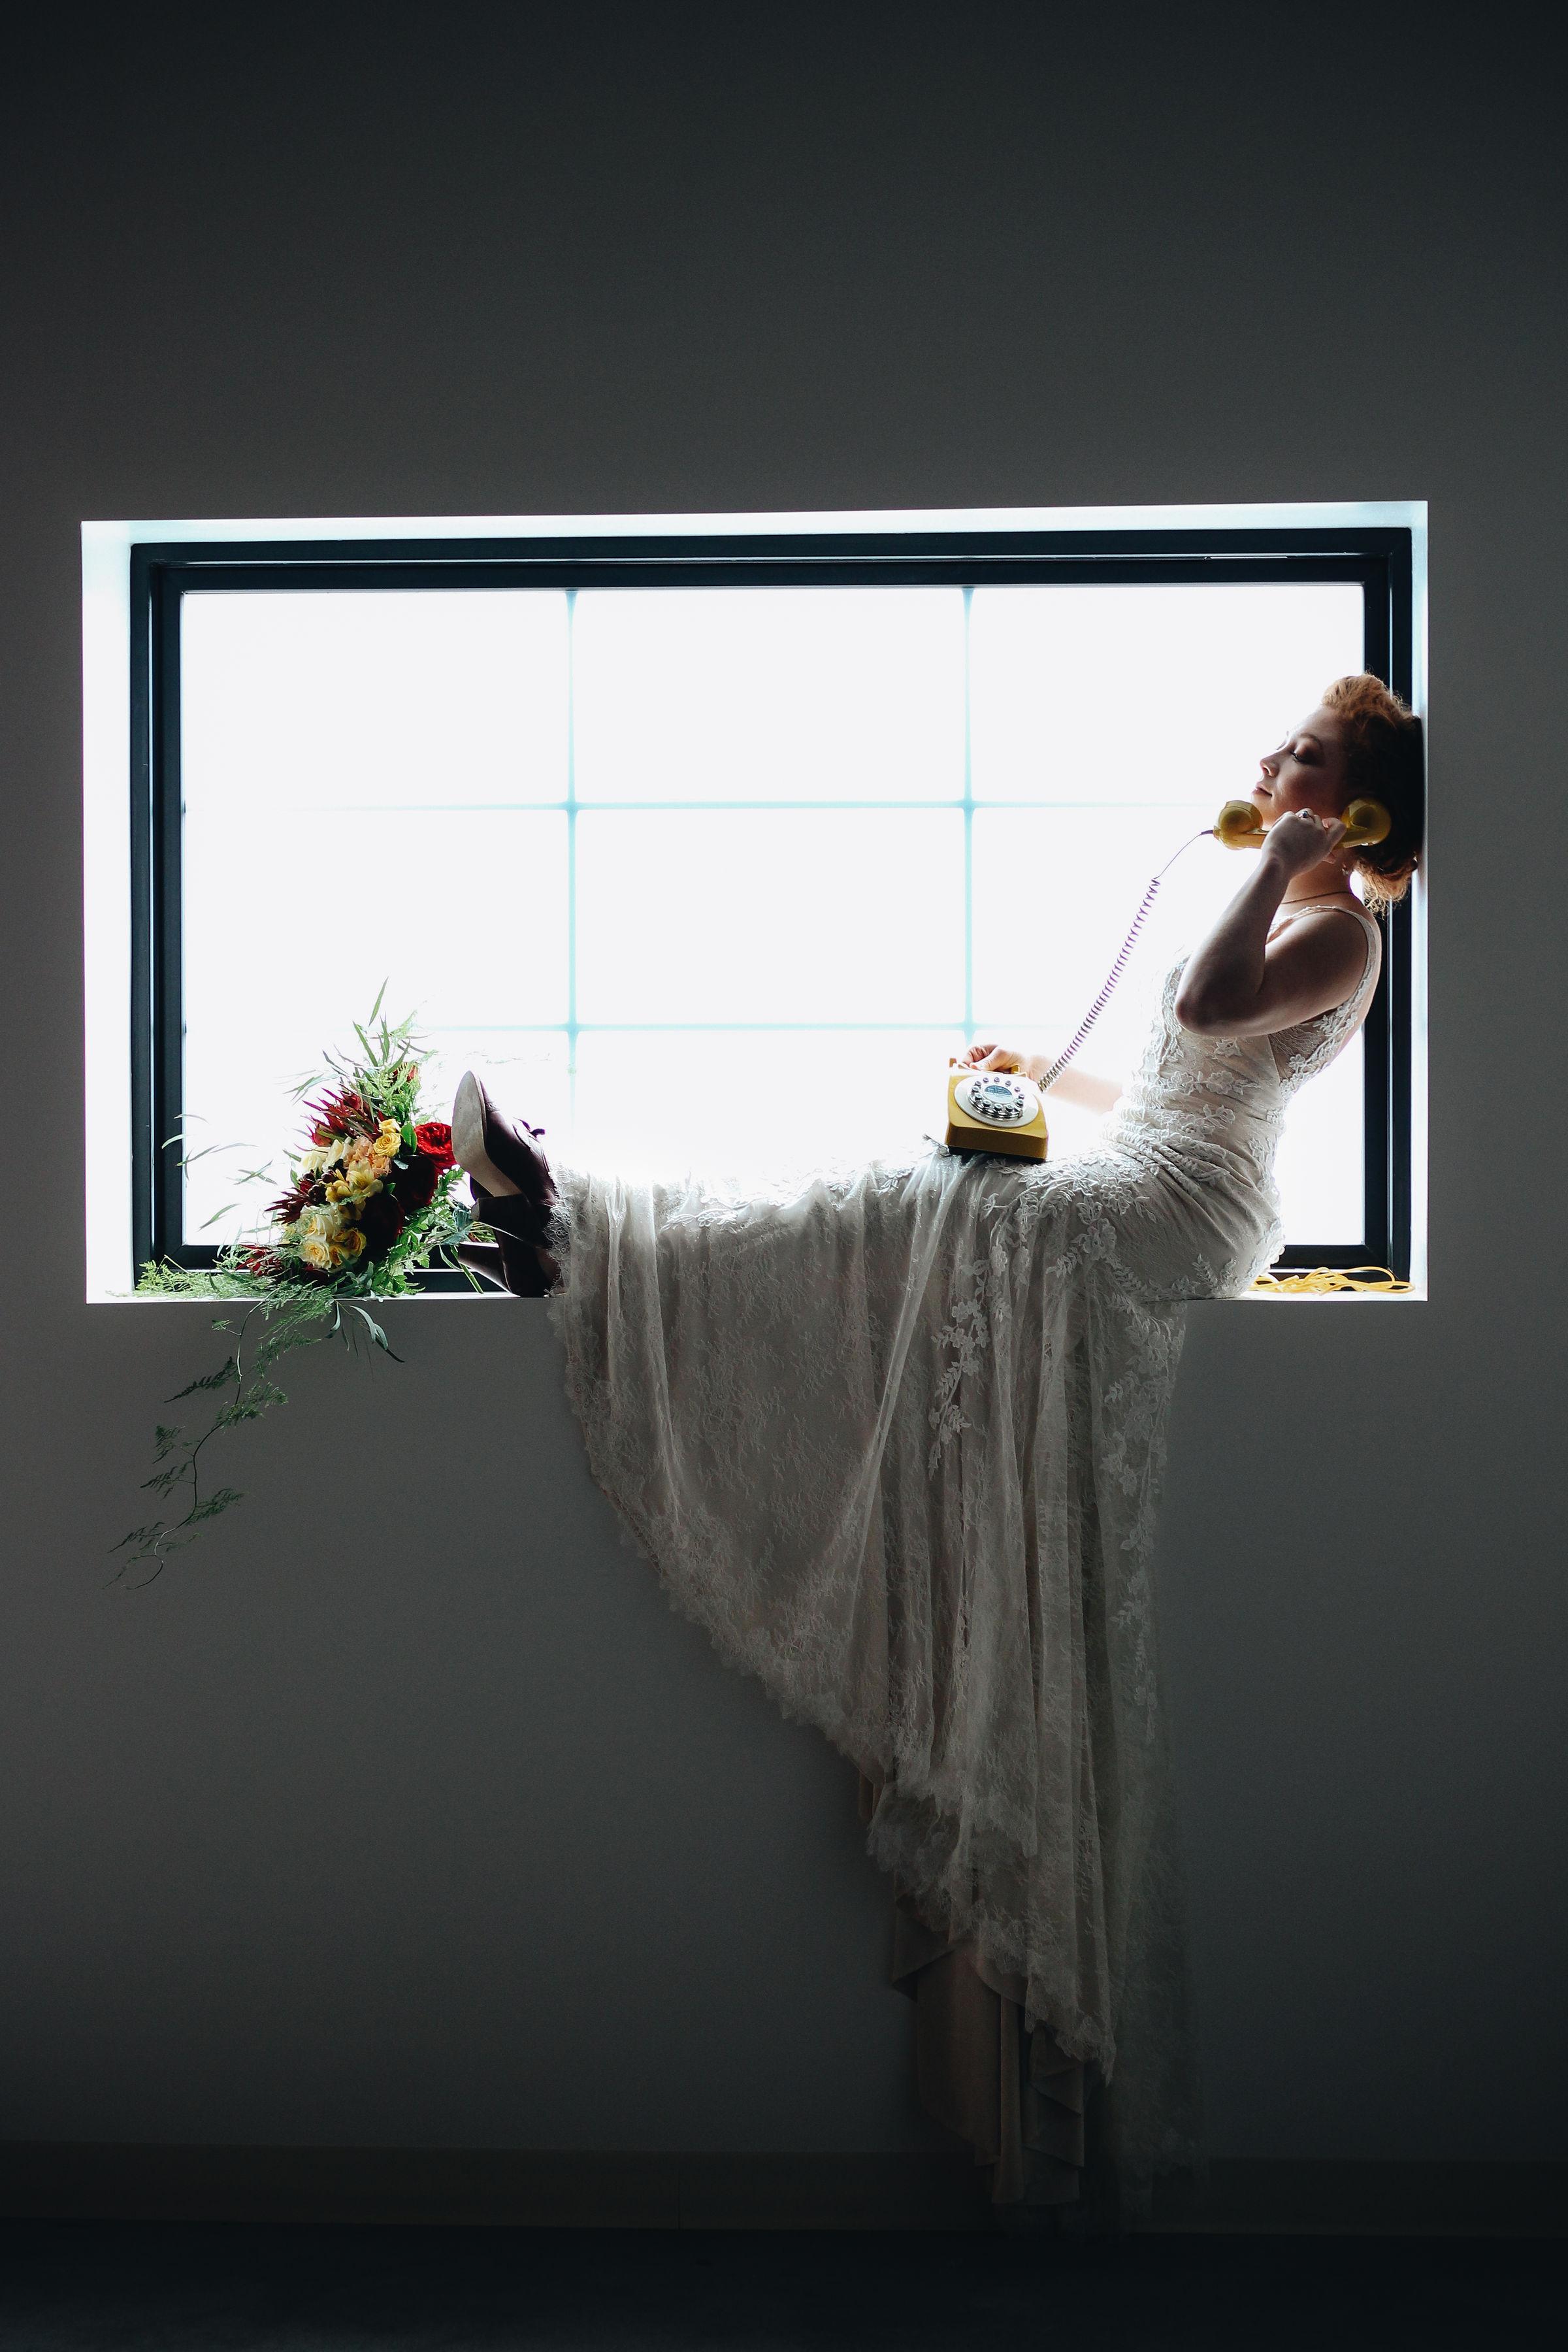 Wes-Anderson-ChettaraTPhotography-Detroit-149.jpg